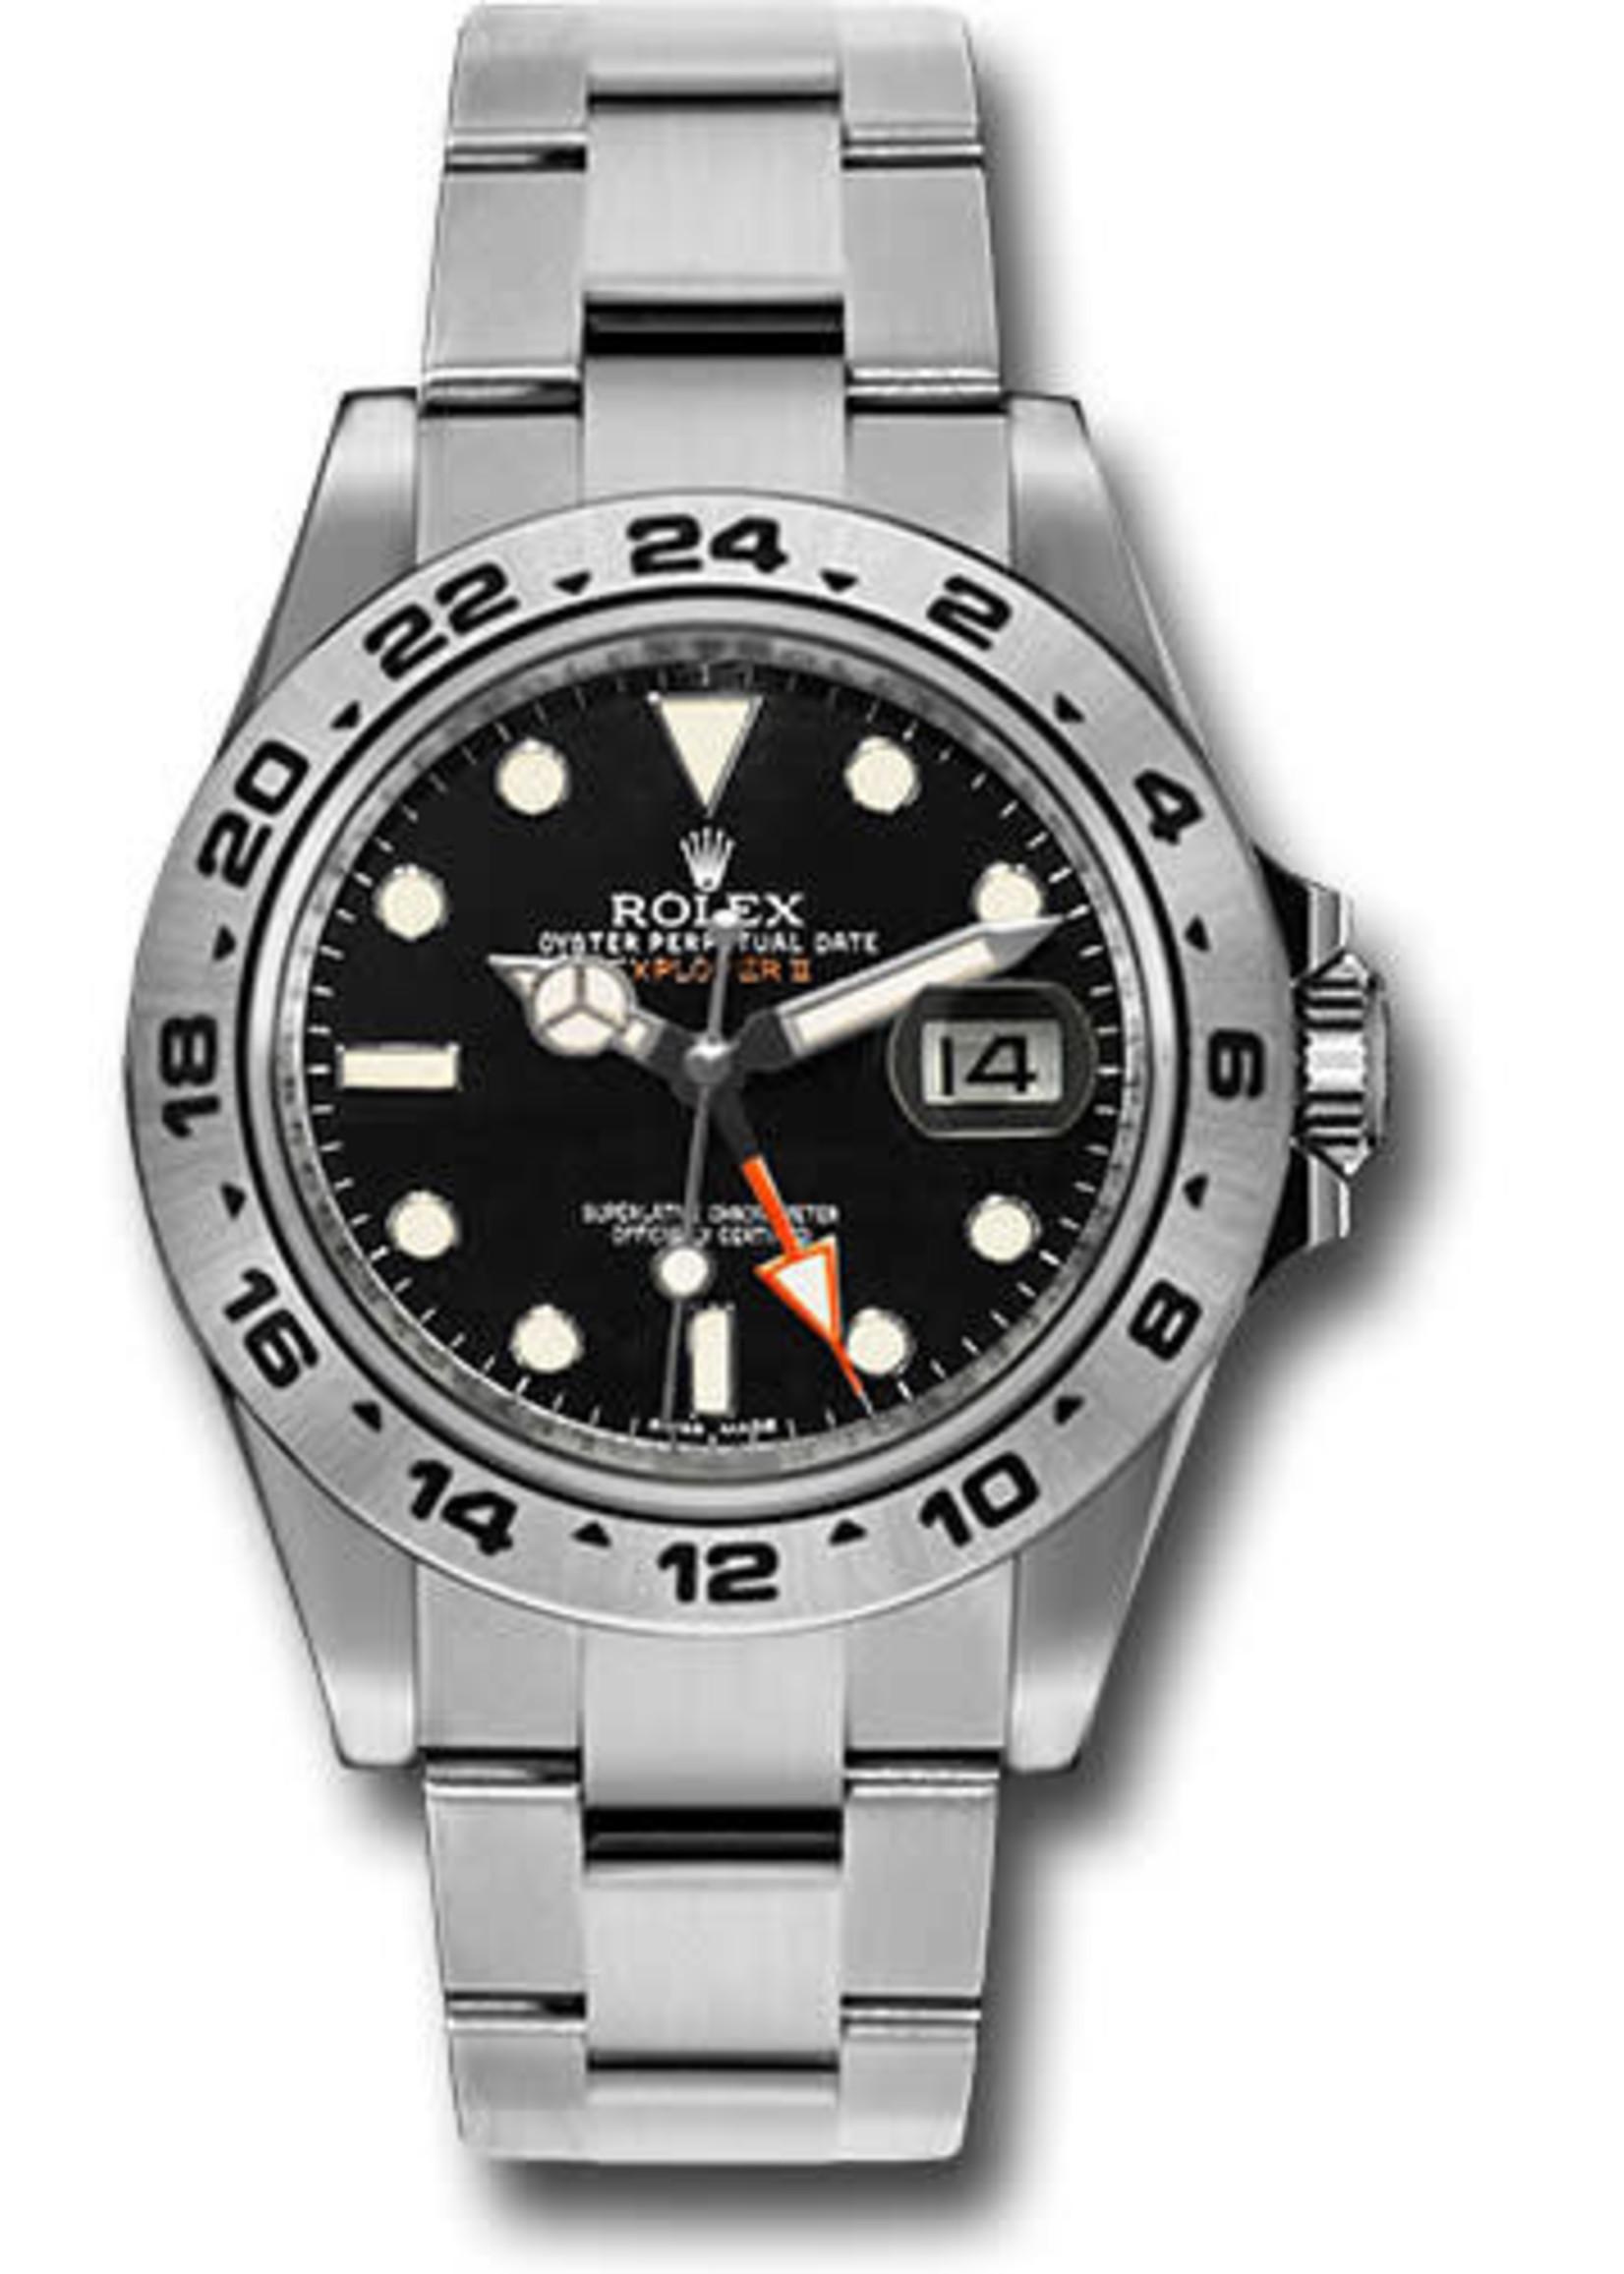 Rolex Rolex Explorer II 42MM (2013 B+P) #216570